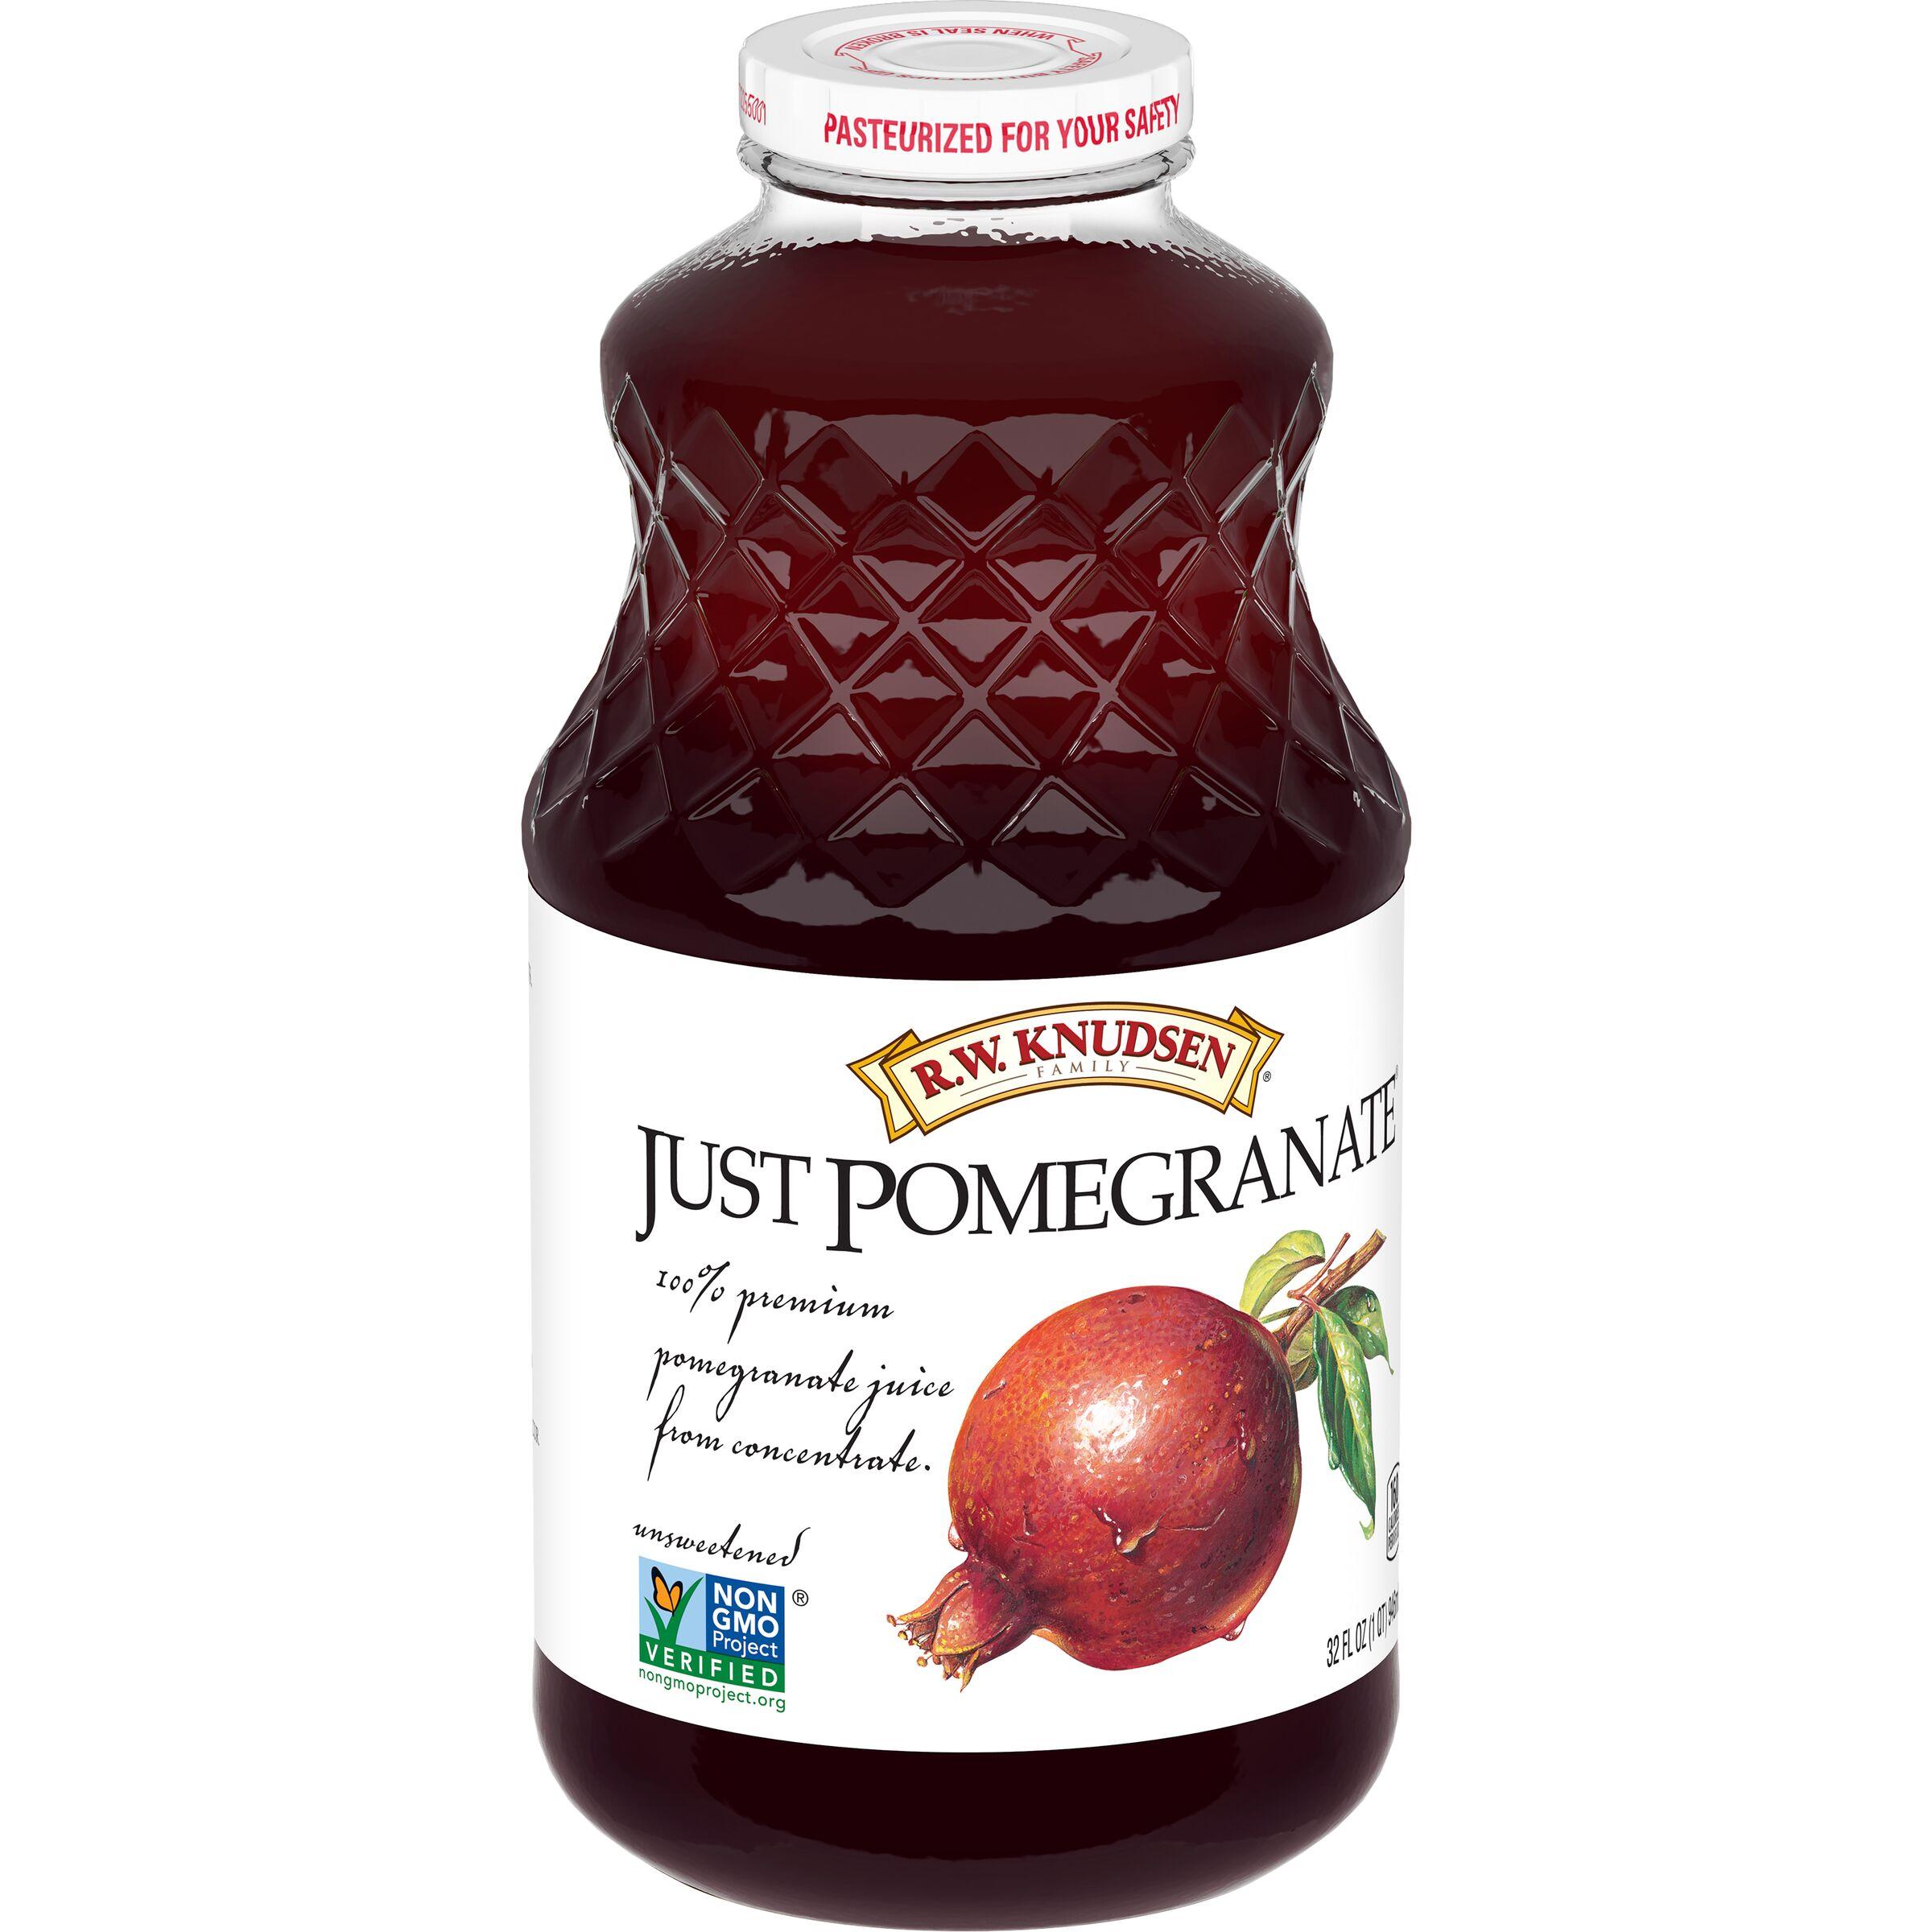 R.W. Knudsen Family  Just Pomegranate™ Juice